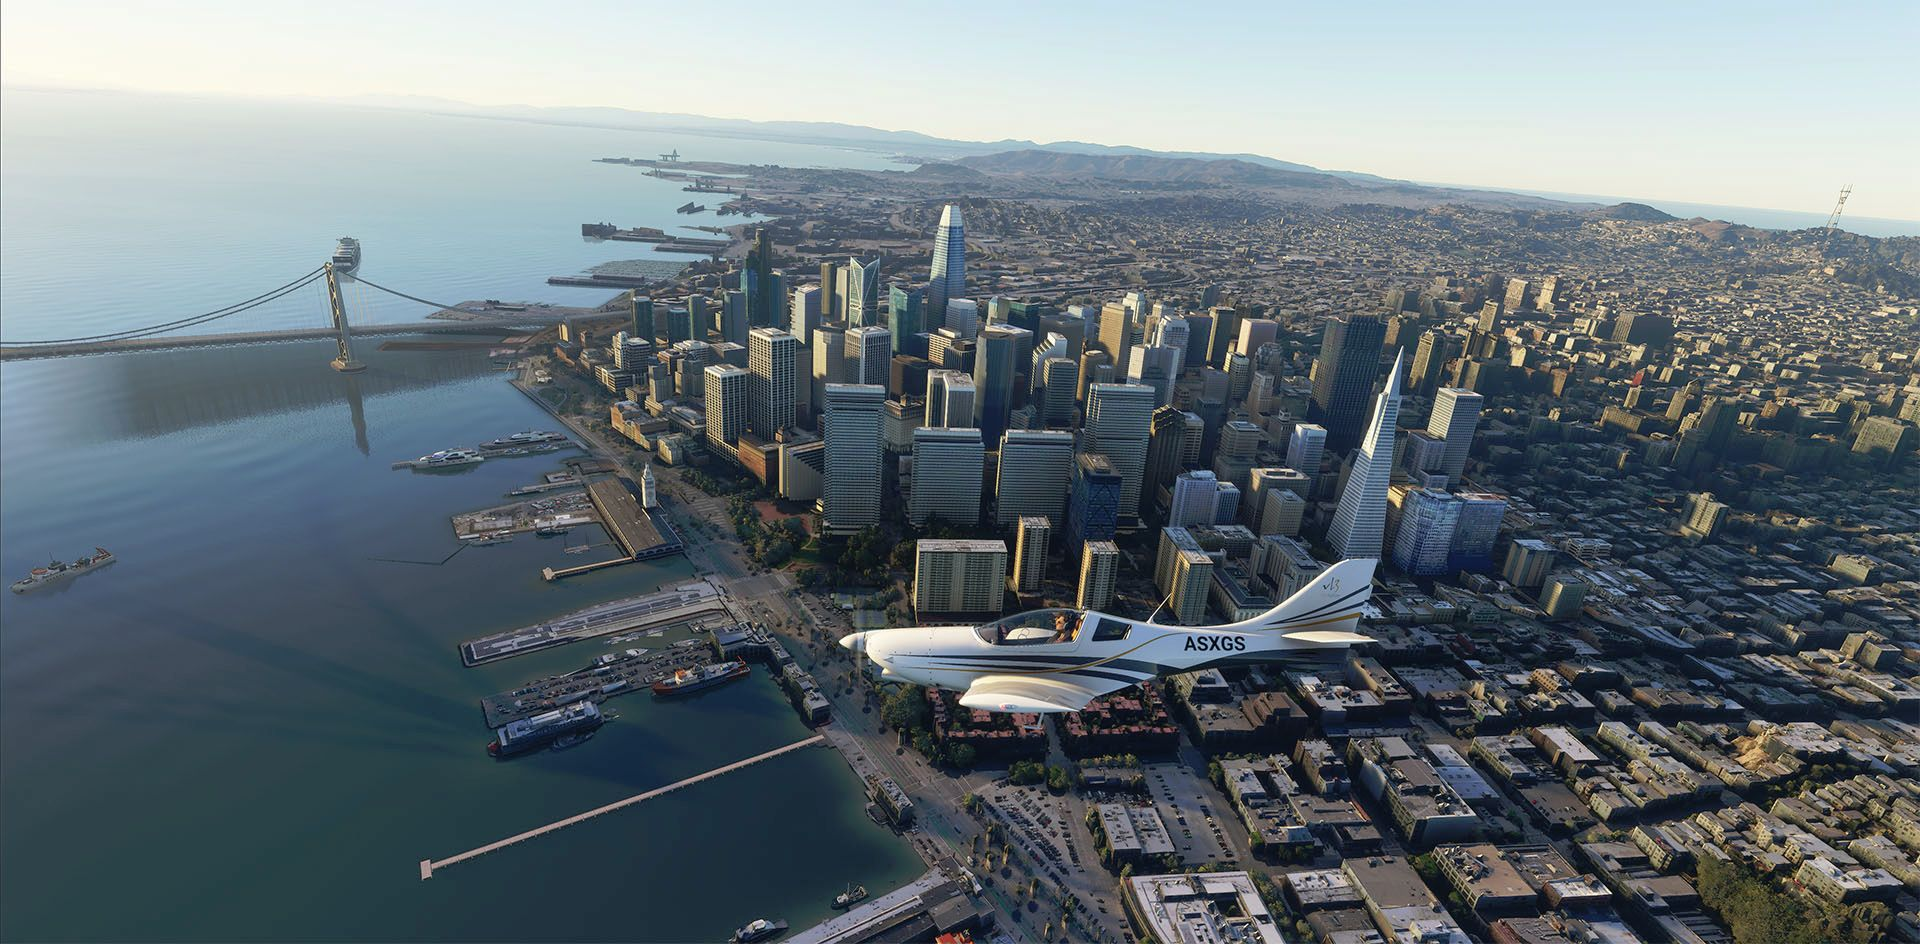 MSFS San Francisco Photogrammetry